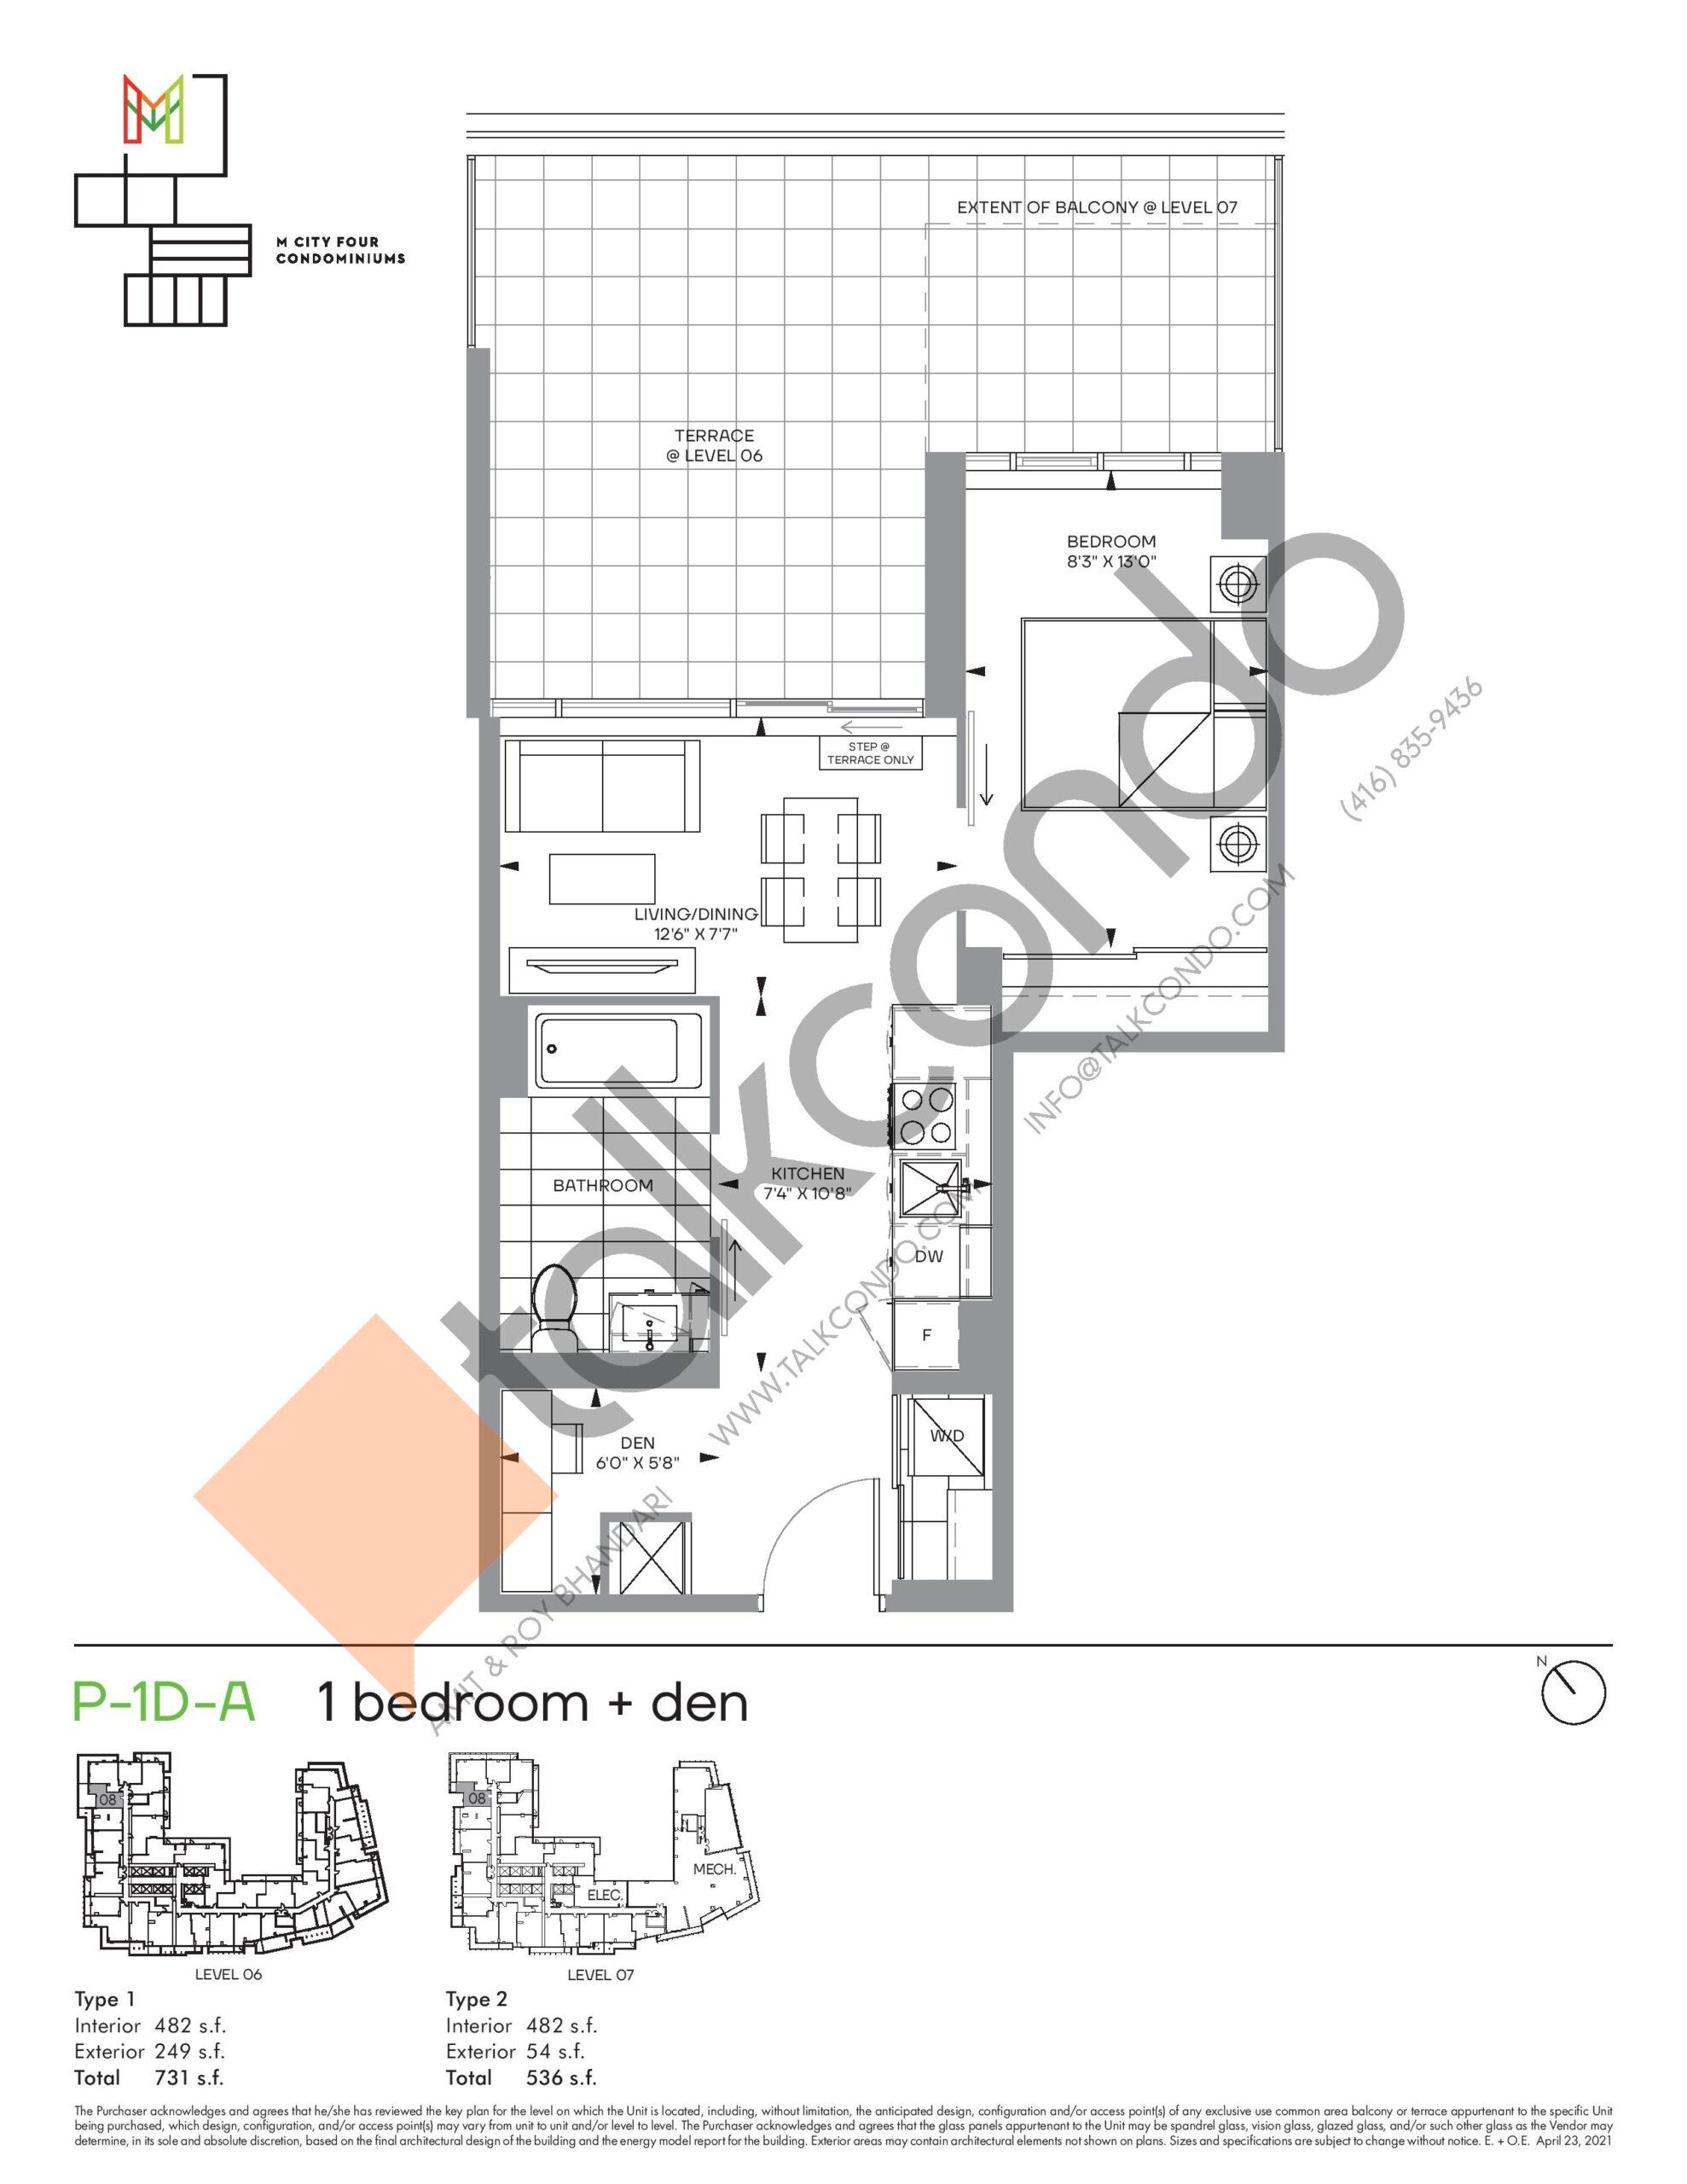 P-1D-A (Podium) Floor Plan at M4 Condos - 482 sq.ft